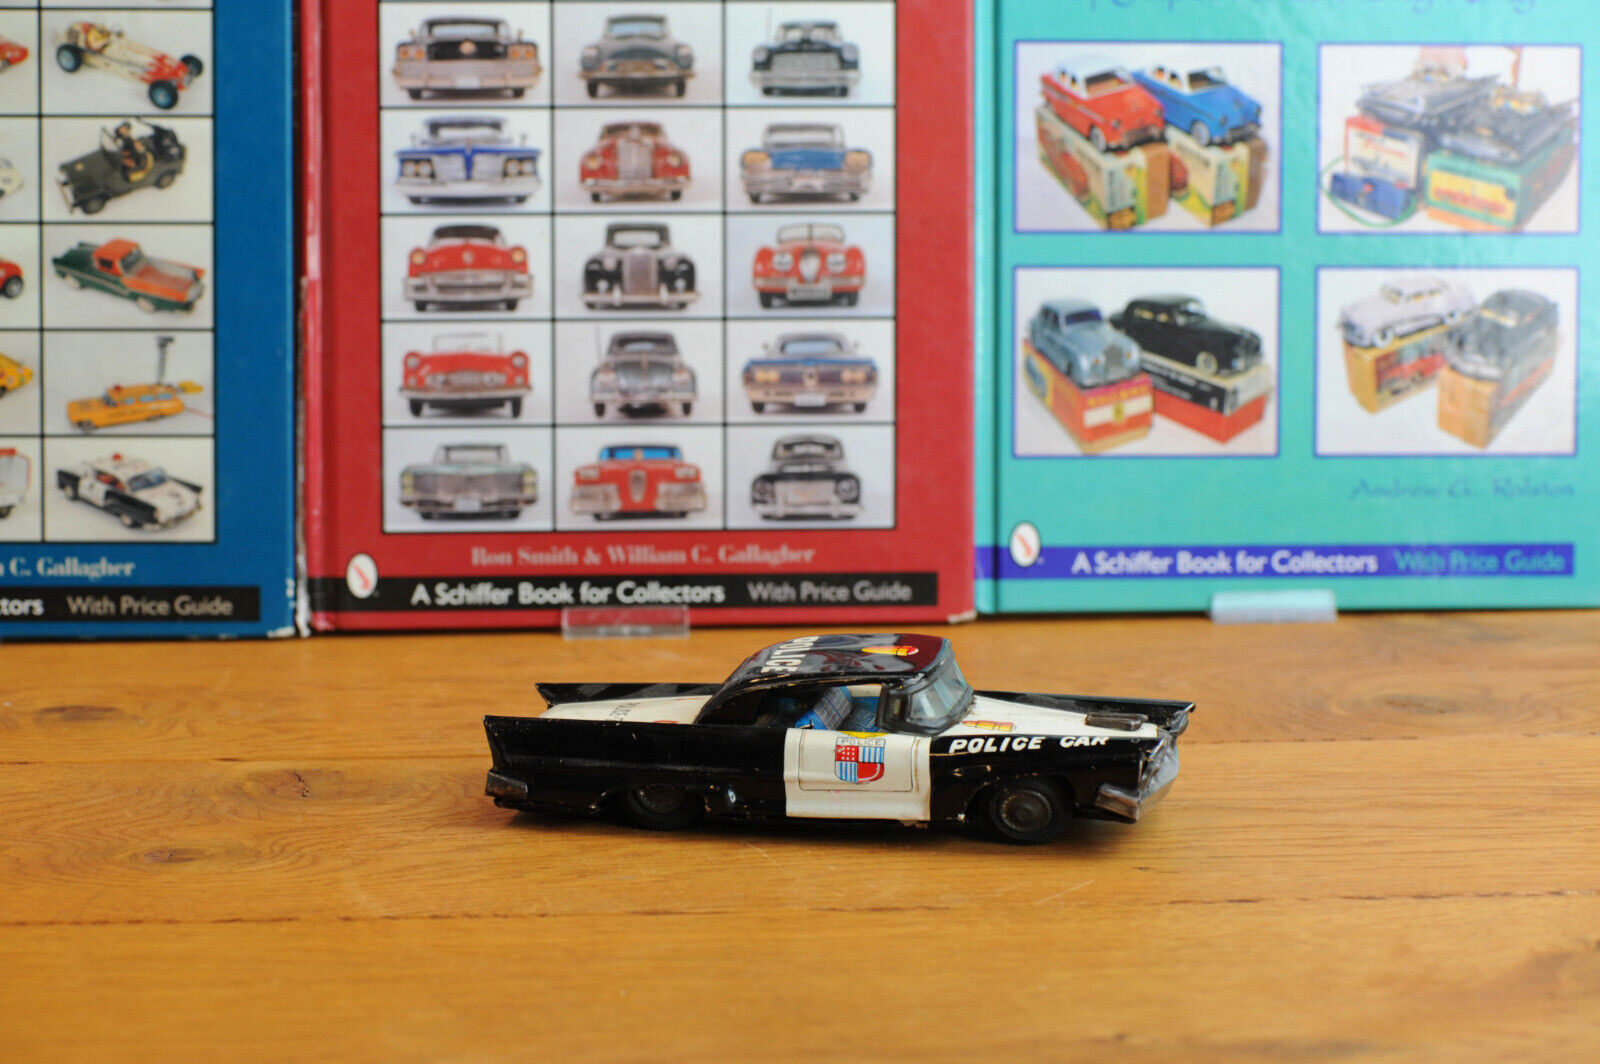 _AntiqueTin leksakjapaner Kokyu Shokai Cadillac Police bil japan Sällsynt